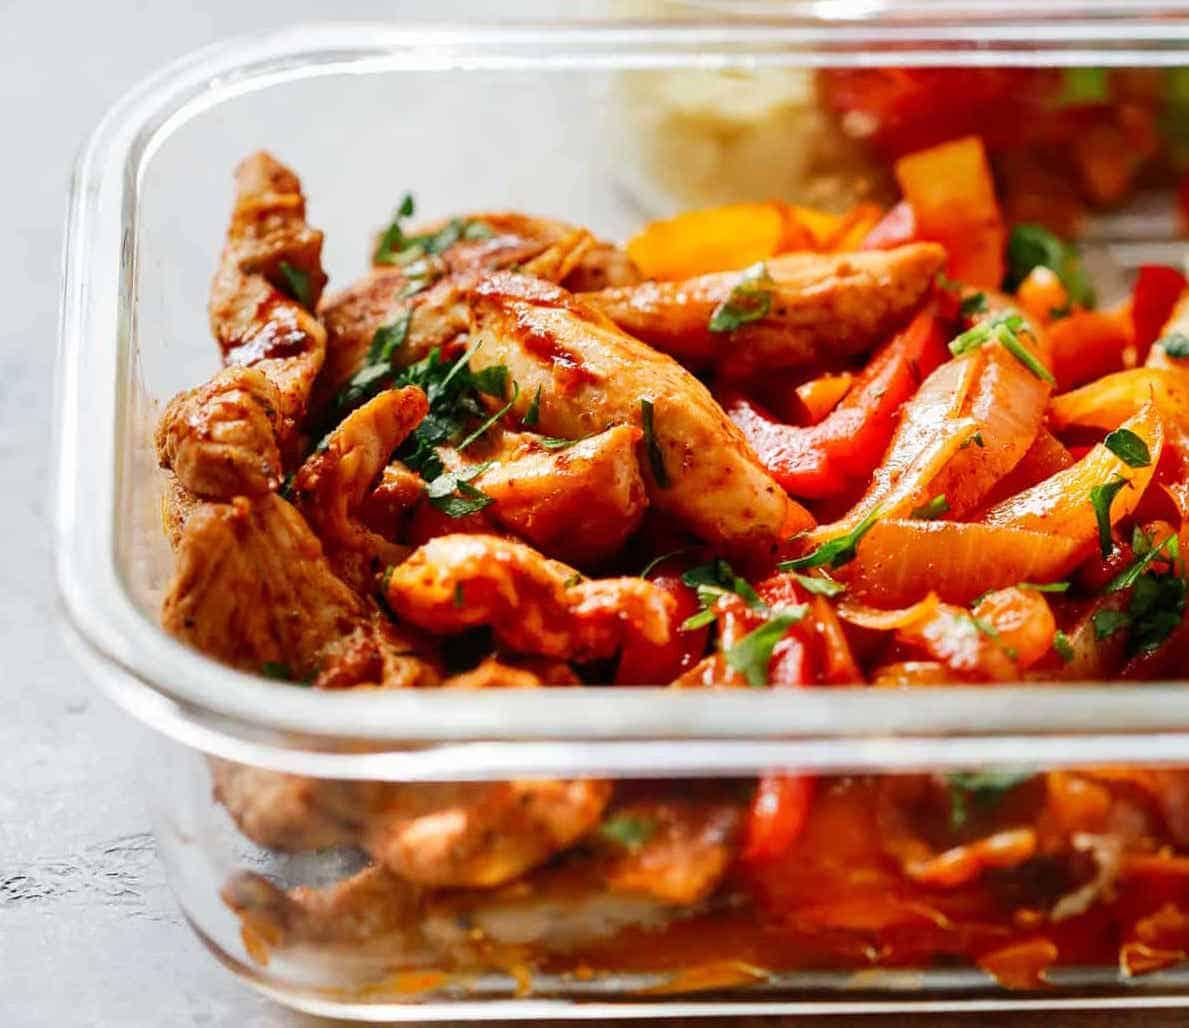 Chicken Fajita Meal Prep Bowls